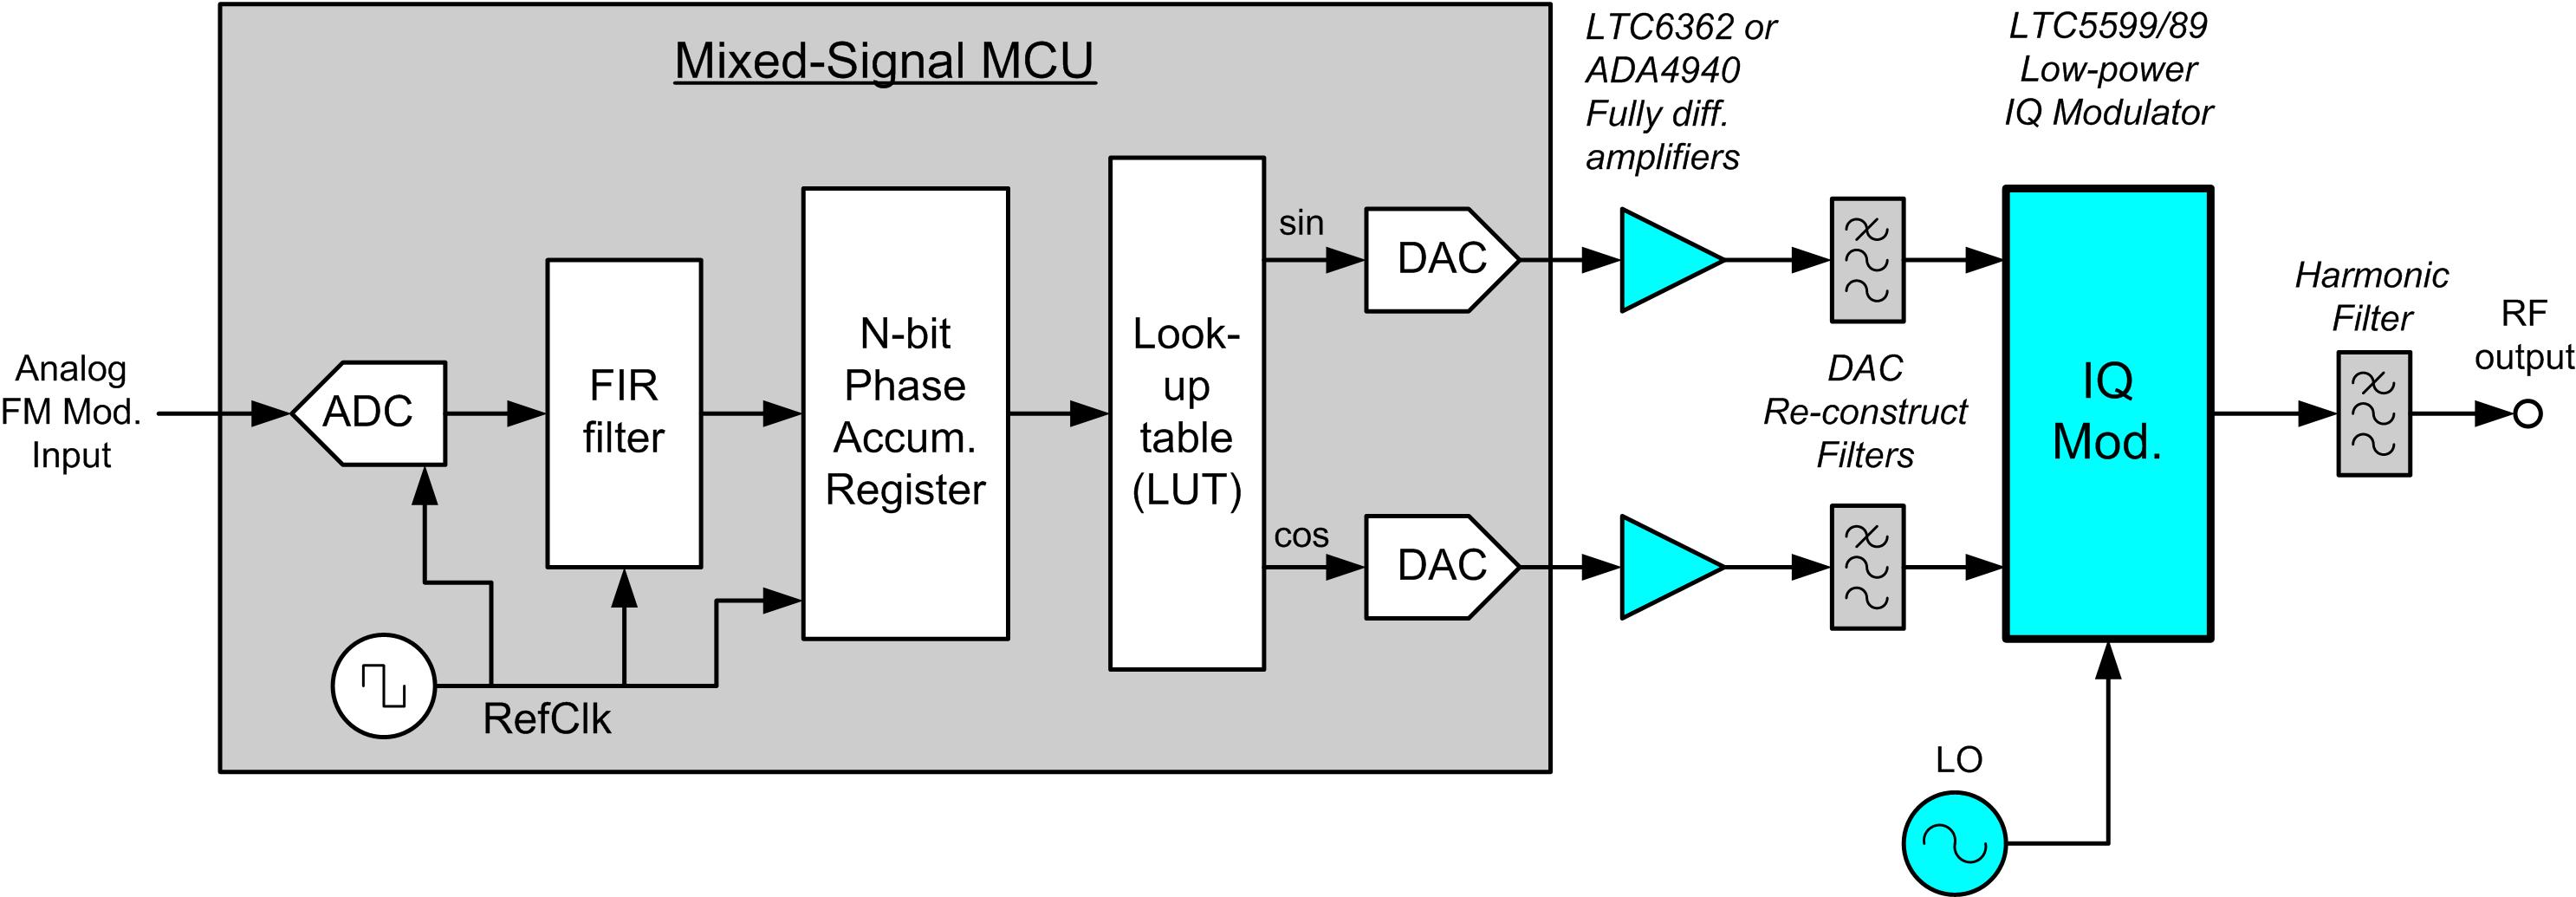 generating fm using an iq modulator  [ 2973 x 1035 Pixel ]